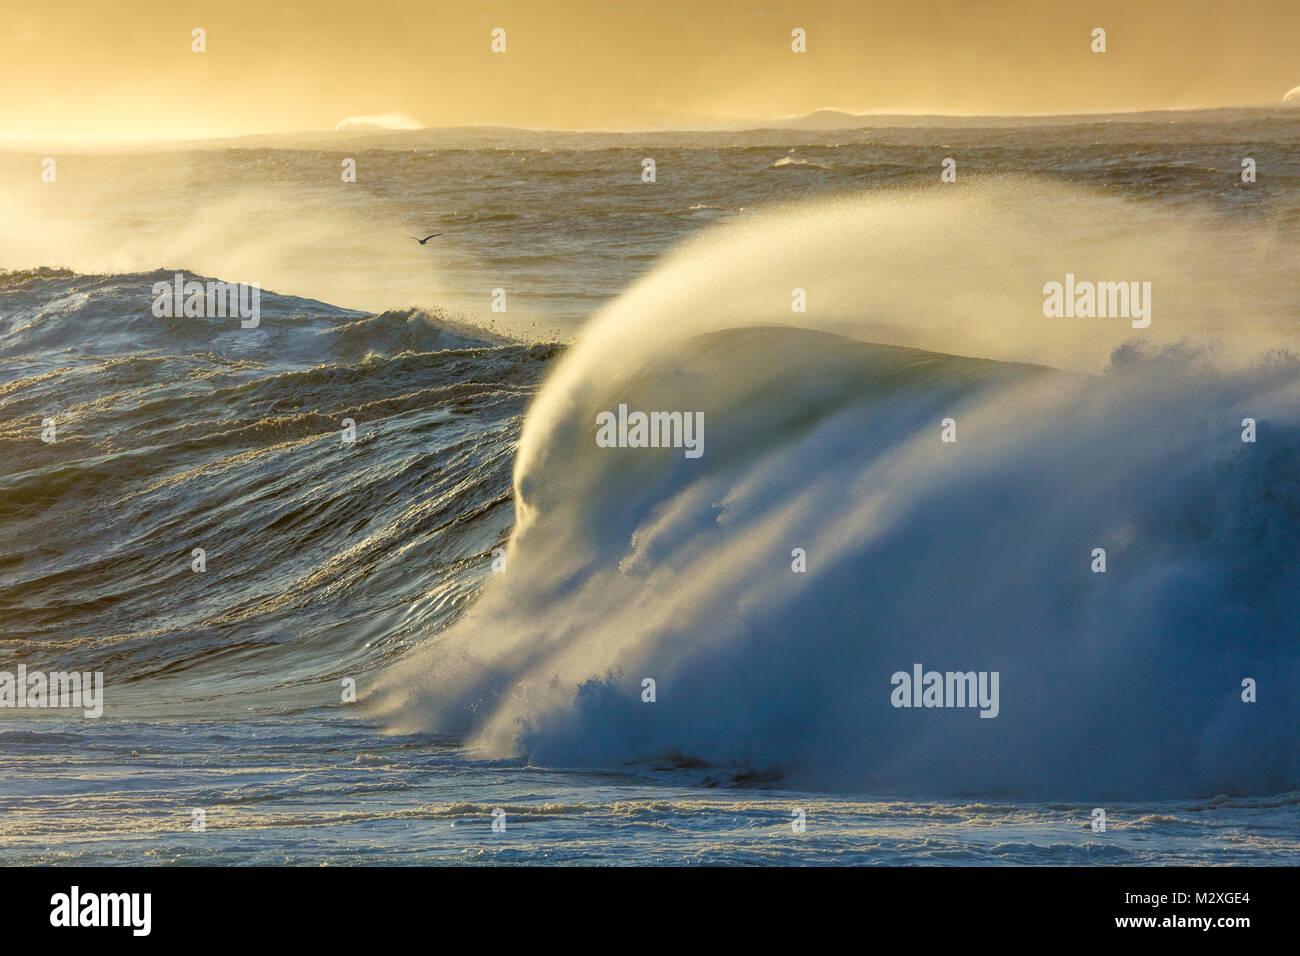 Atlantic storm waves breaking near Ballycastle, County Mayo, Ireland. Stock Photo